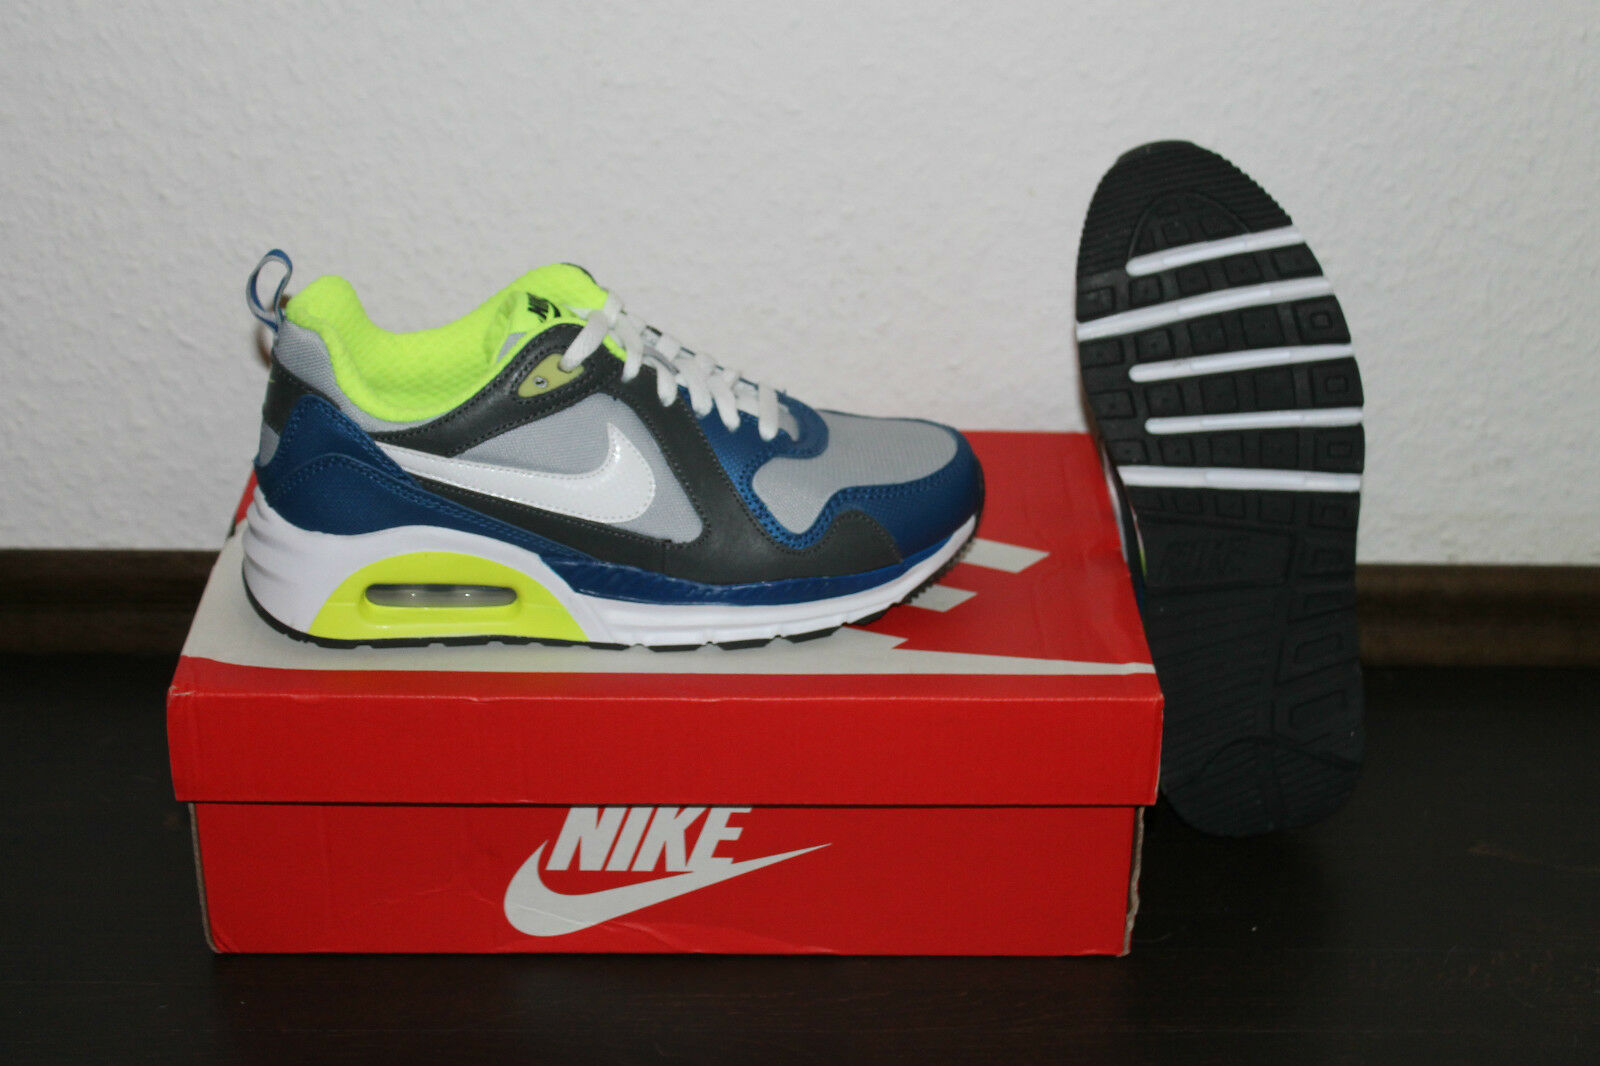 Nike Air Max Trax Damen Running Schuhe Grau Weiß Blau Größe 36,5 38 oder 38,5